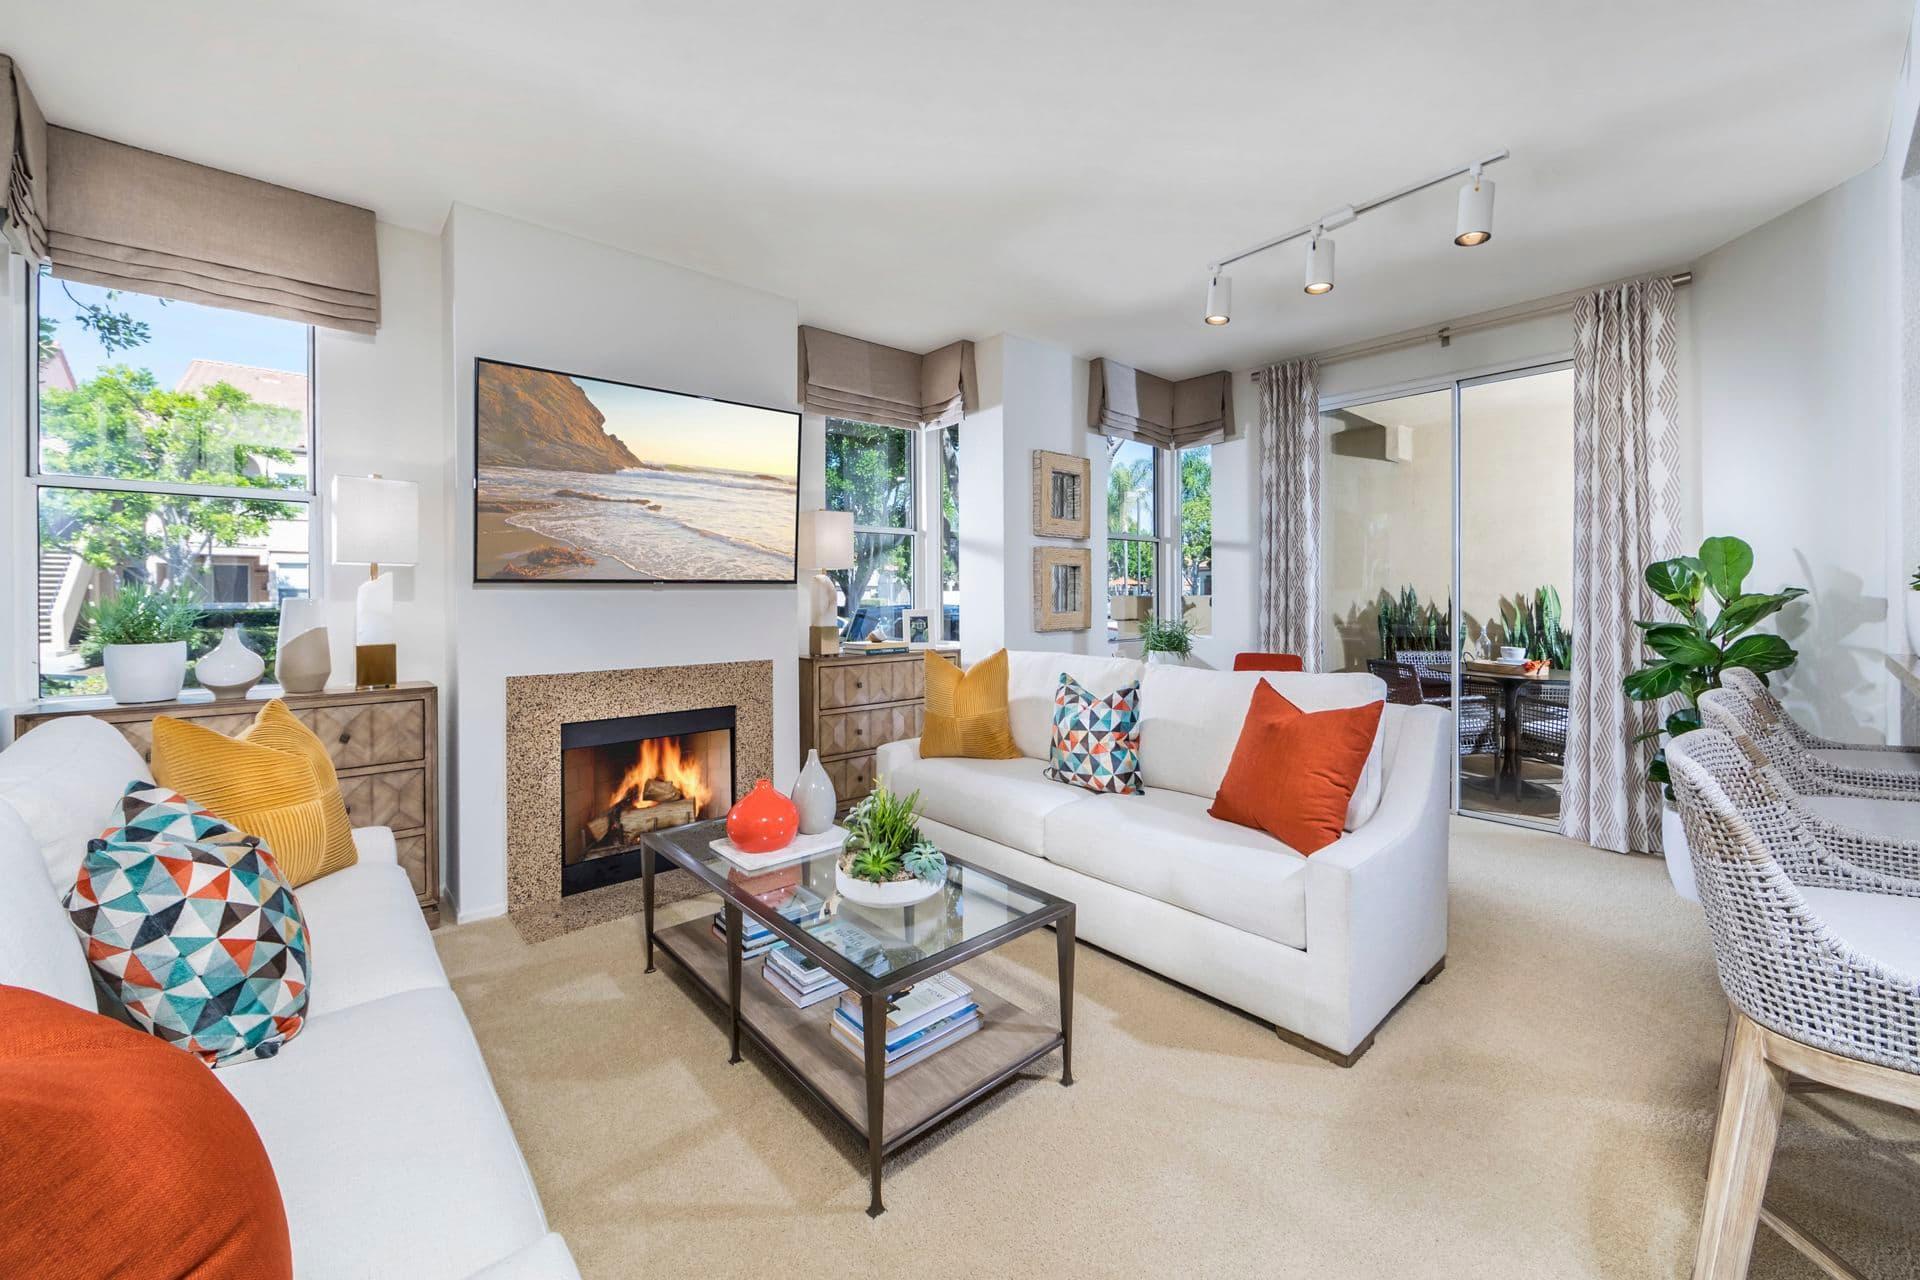 Interior view of living room at San Carlo Villa Apartment Homes in Irvine, CA.